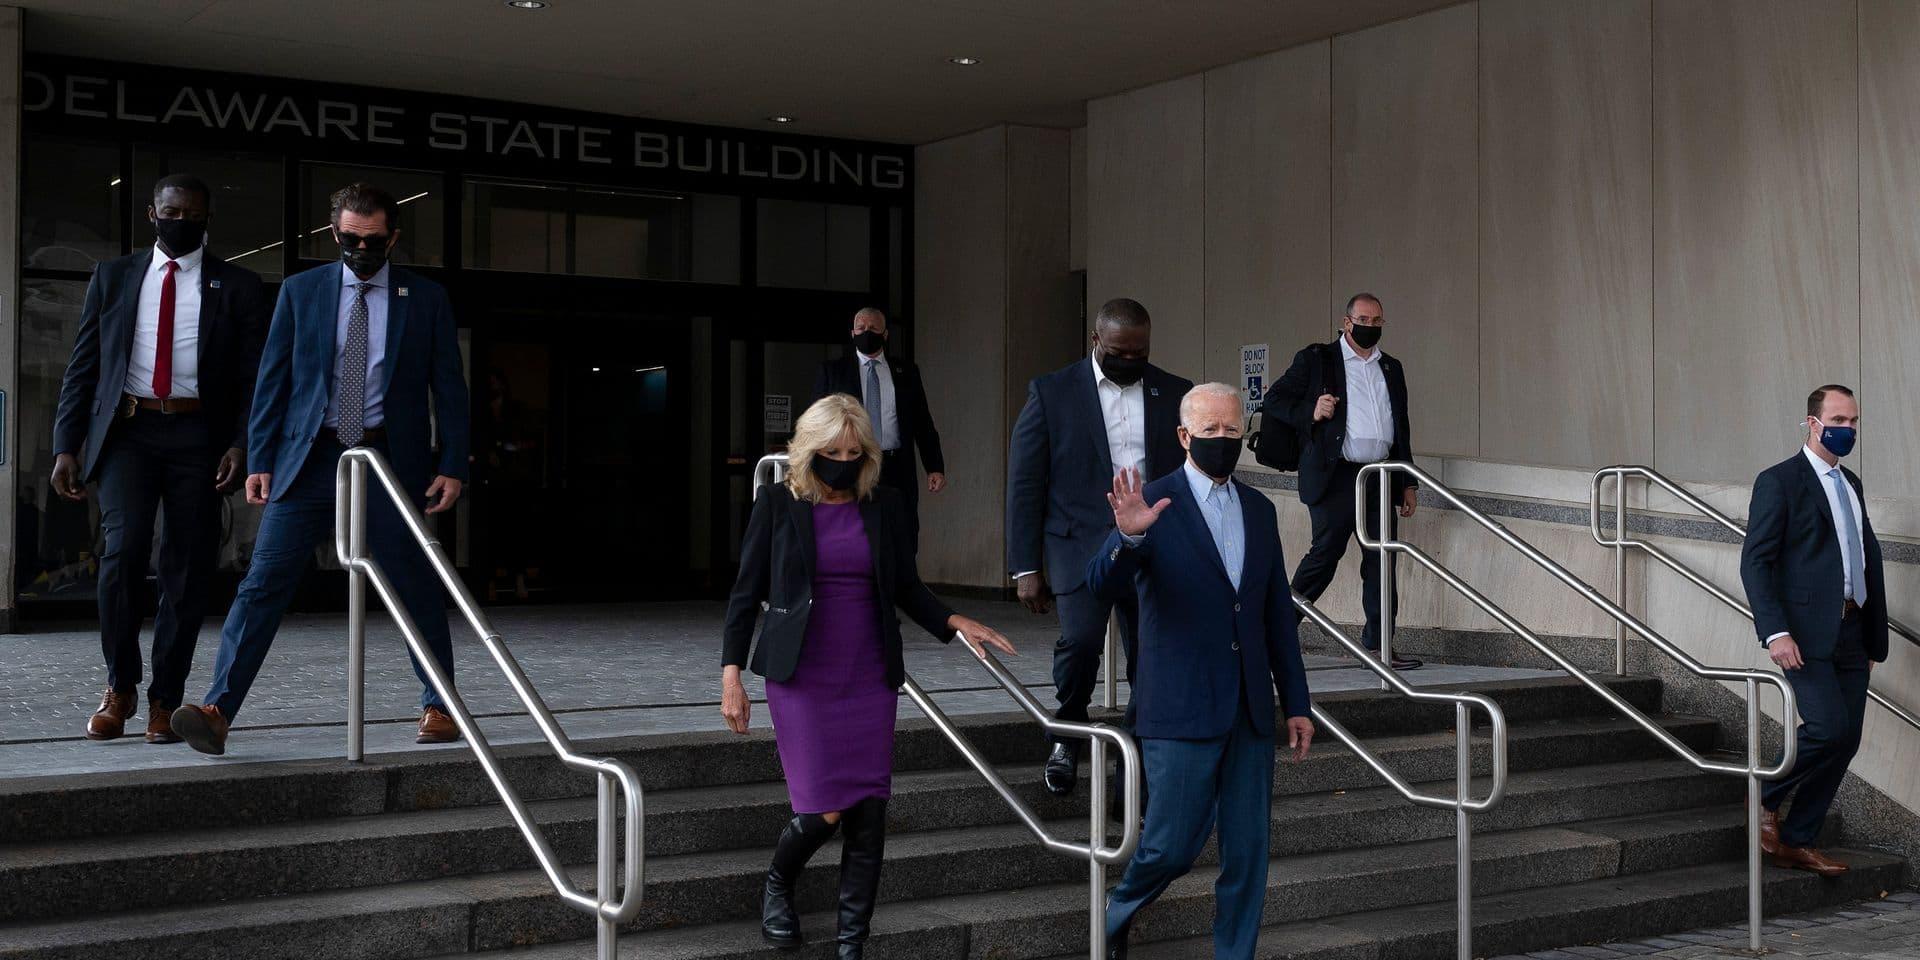 Quand les bottes de la femme de Joe Biden font passer un message à Donald Trump (PHOTOS)